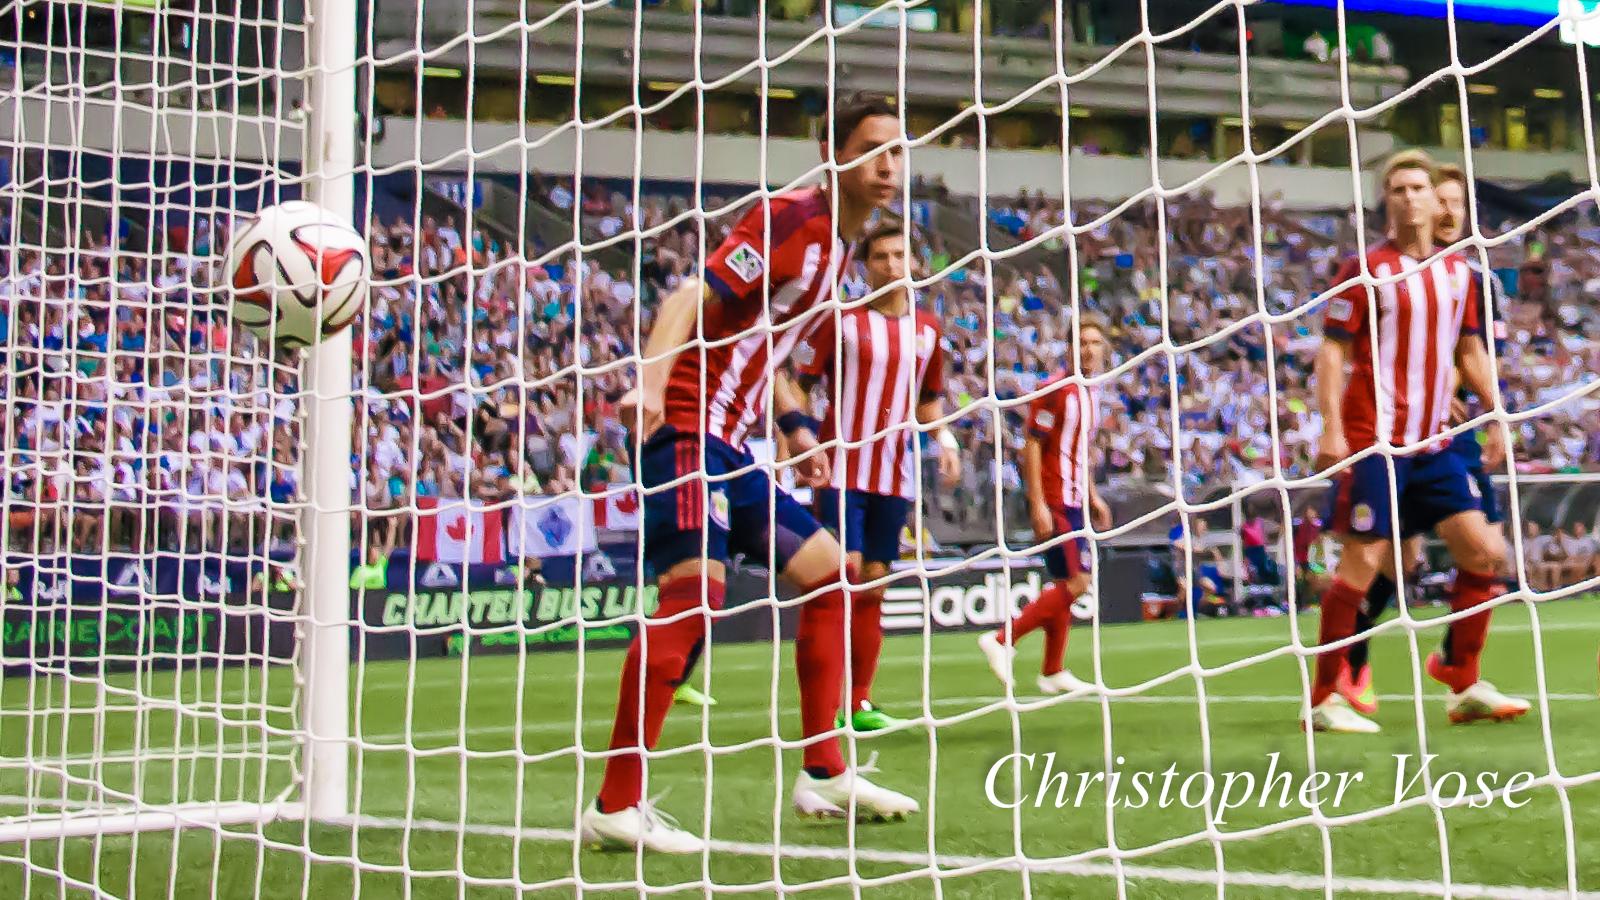 2014-07-12 Carlyle Mitchell Goal 2.jpg